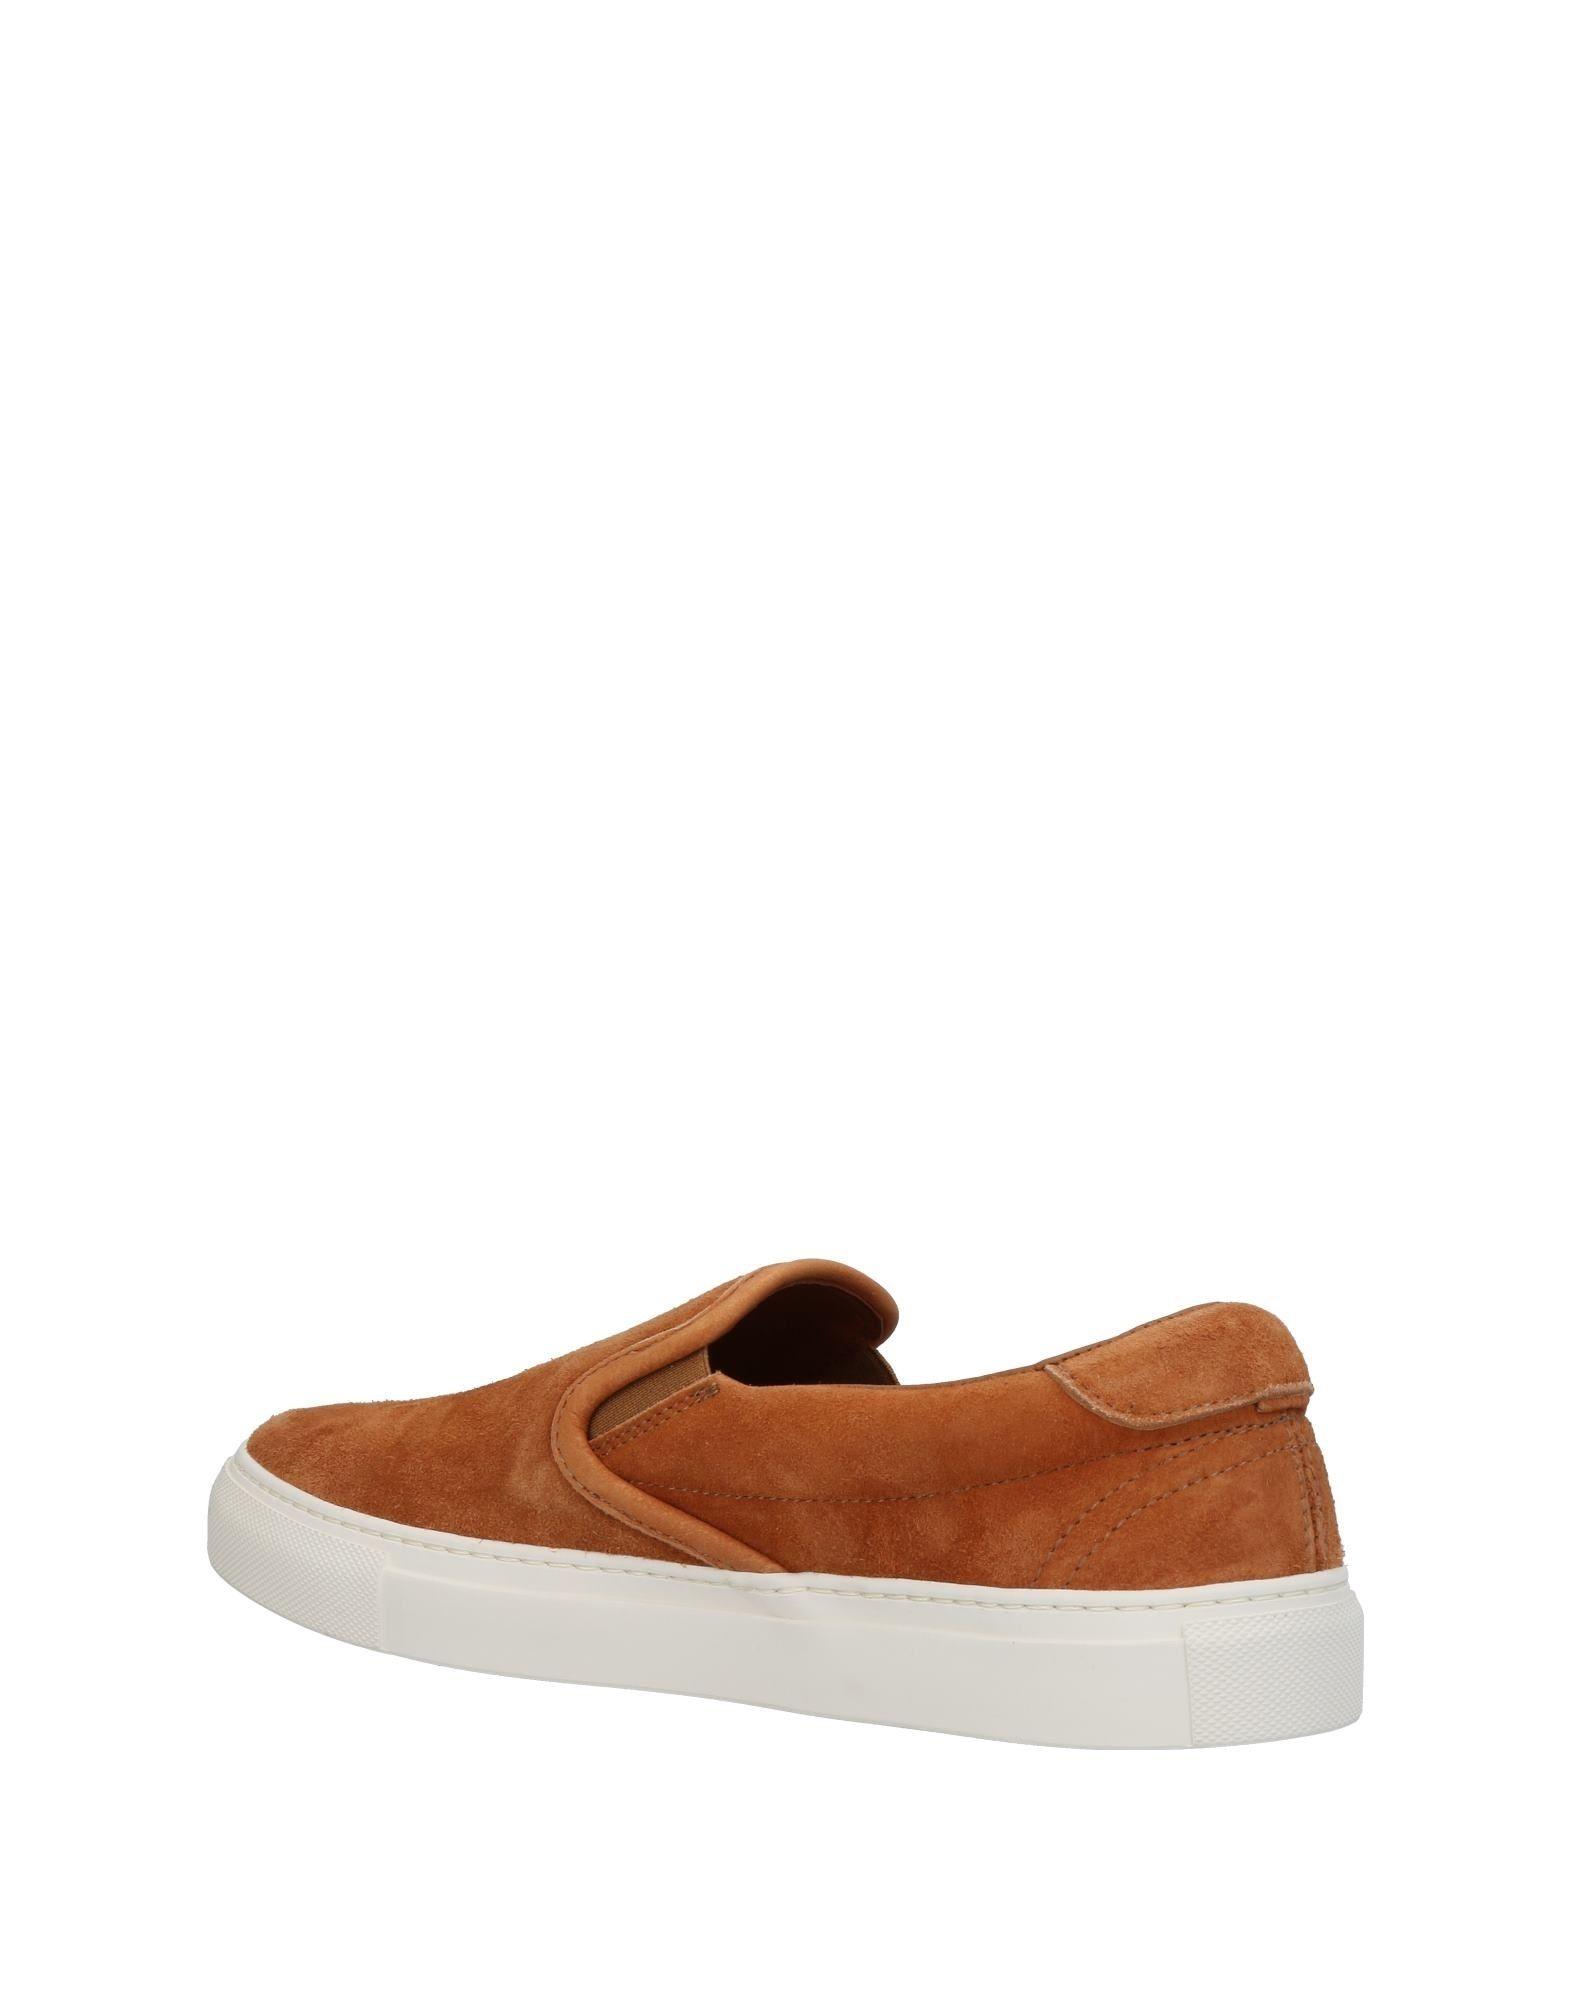 Diemme Sneakers Herren  11418586OT Heiße Schuhe af609b